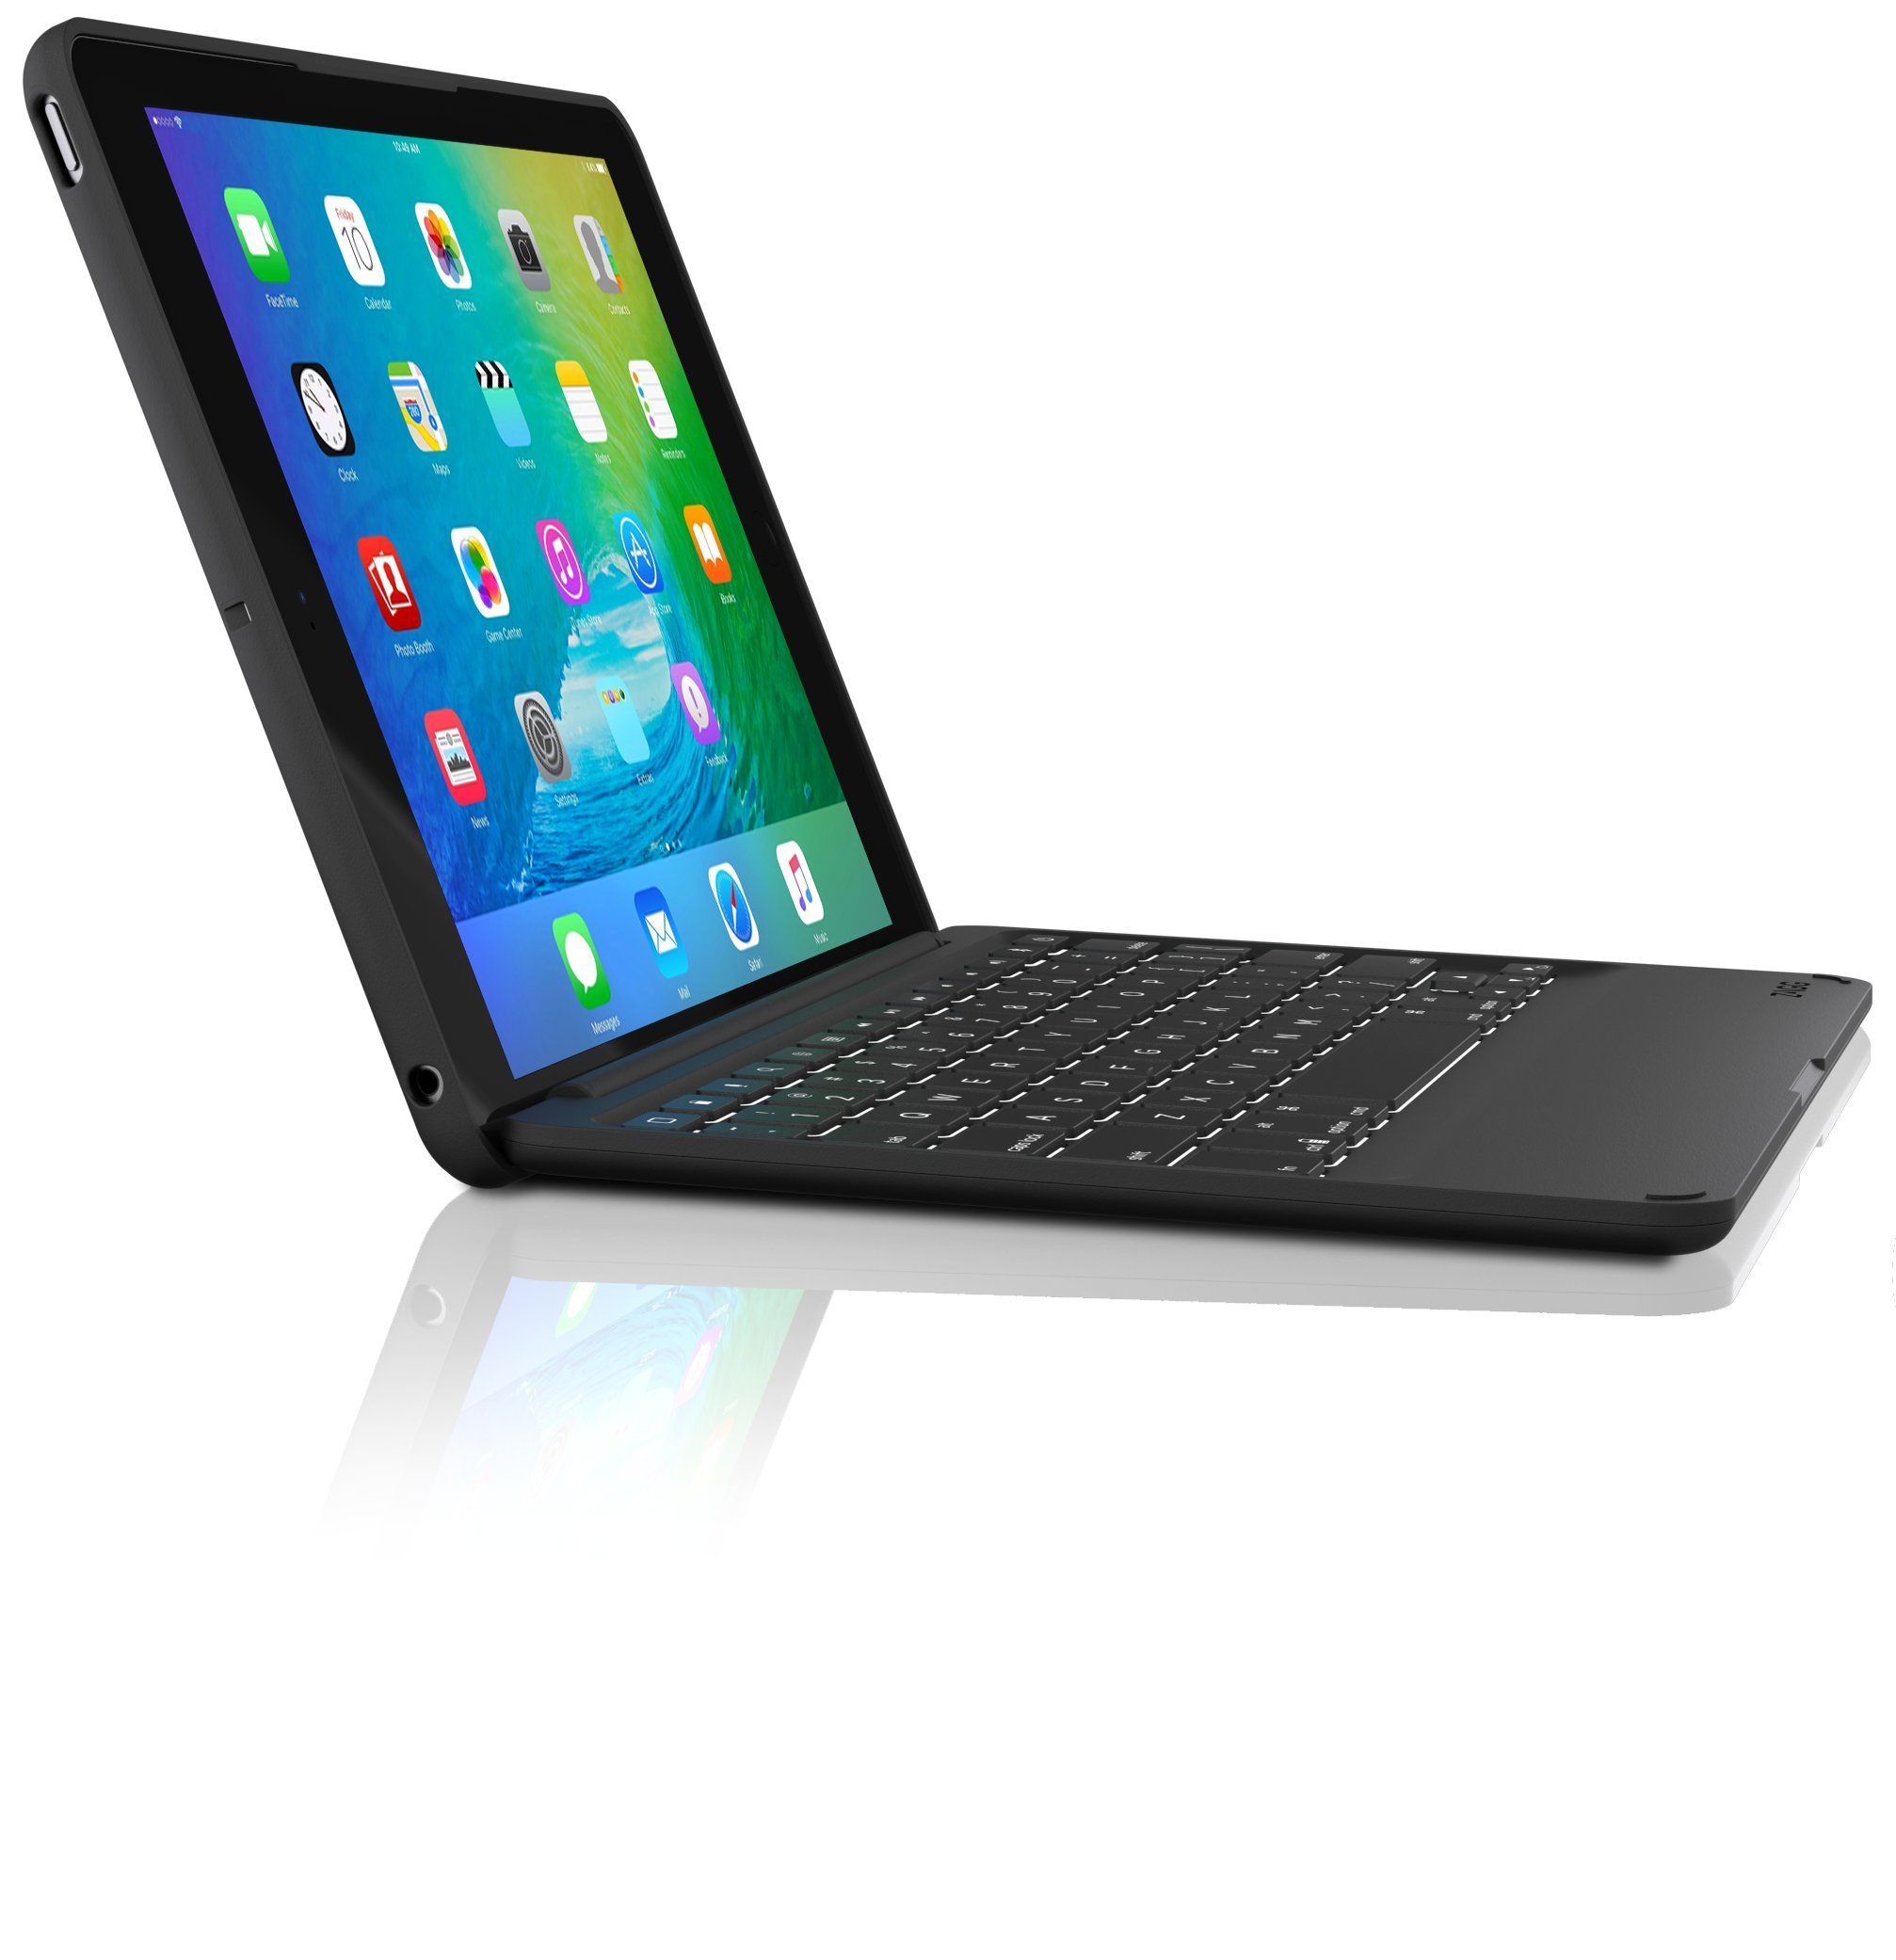 ZAGG Folio Case with Wireless Backlit Keyboard for 2017 [Gen 5] and 2018 [Gen 6] Apple iPad 9.7'' - Black